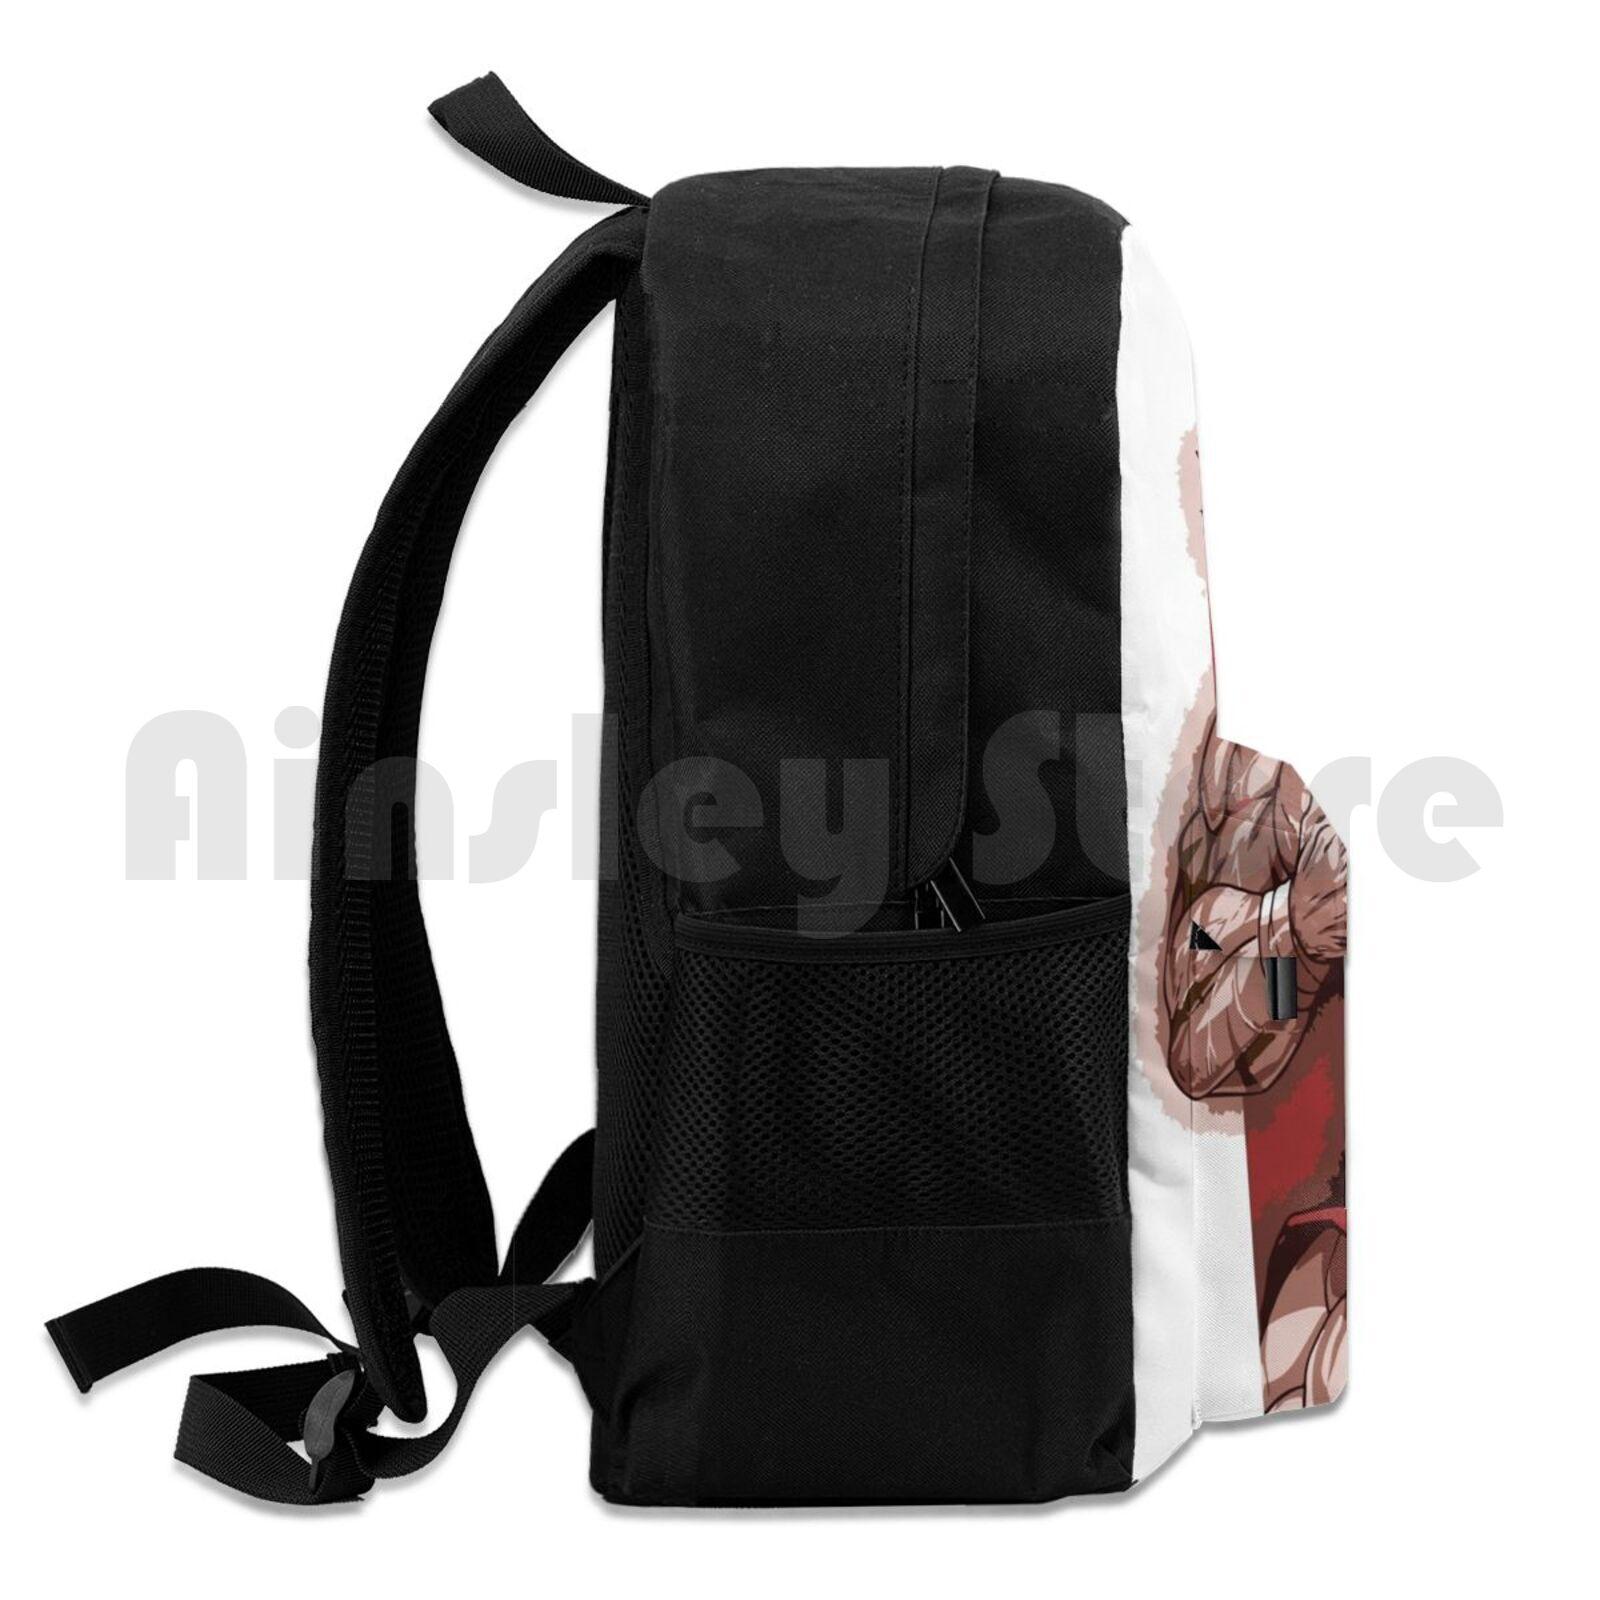 H45124ee8dc054cd1a6630a0588804843S - Anime Backpacks